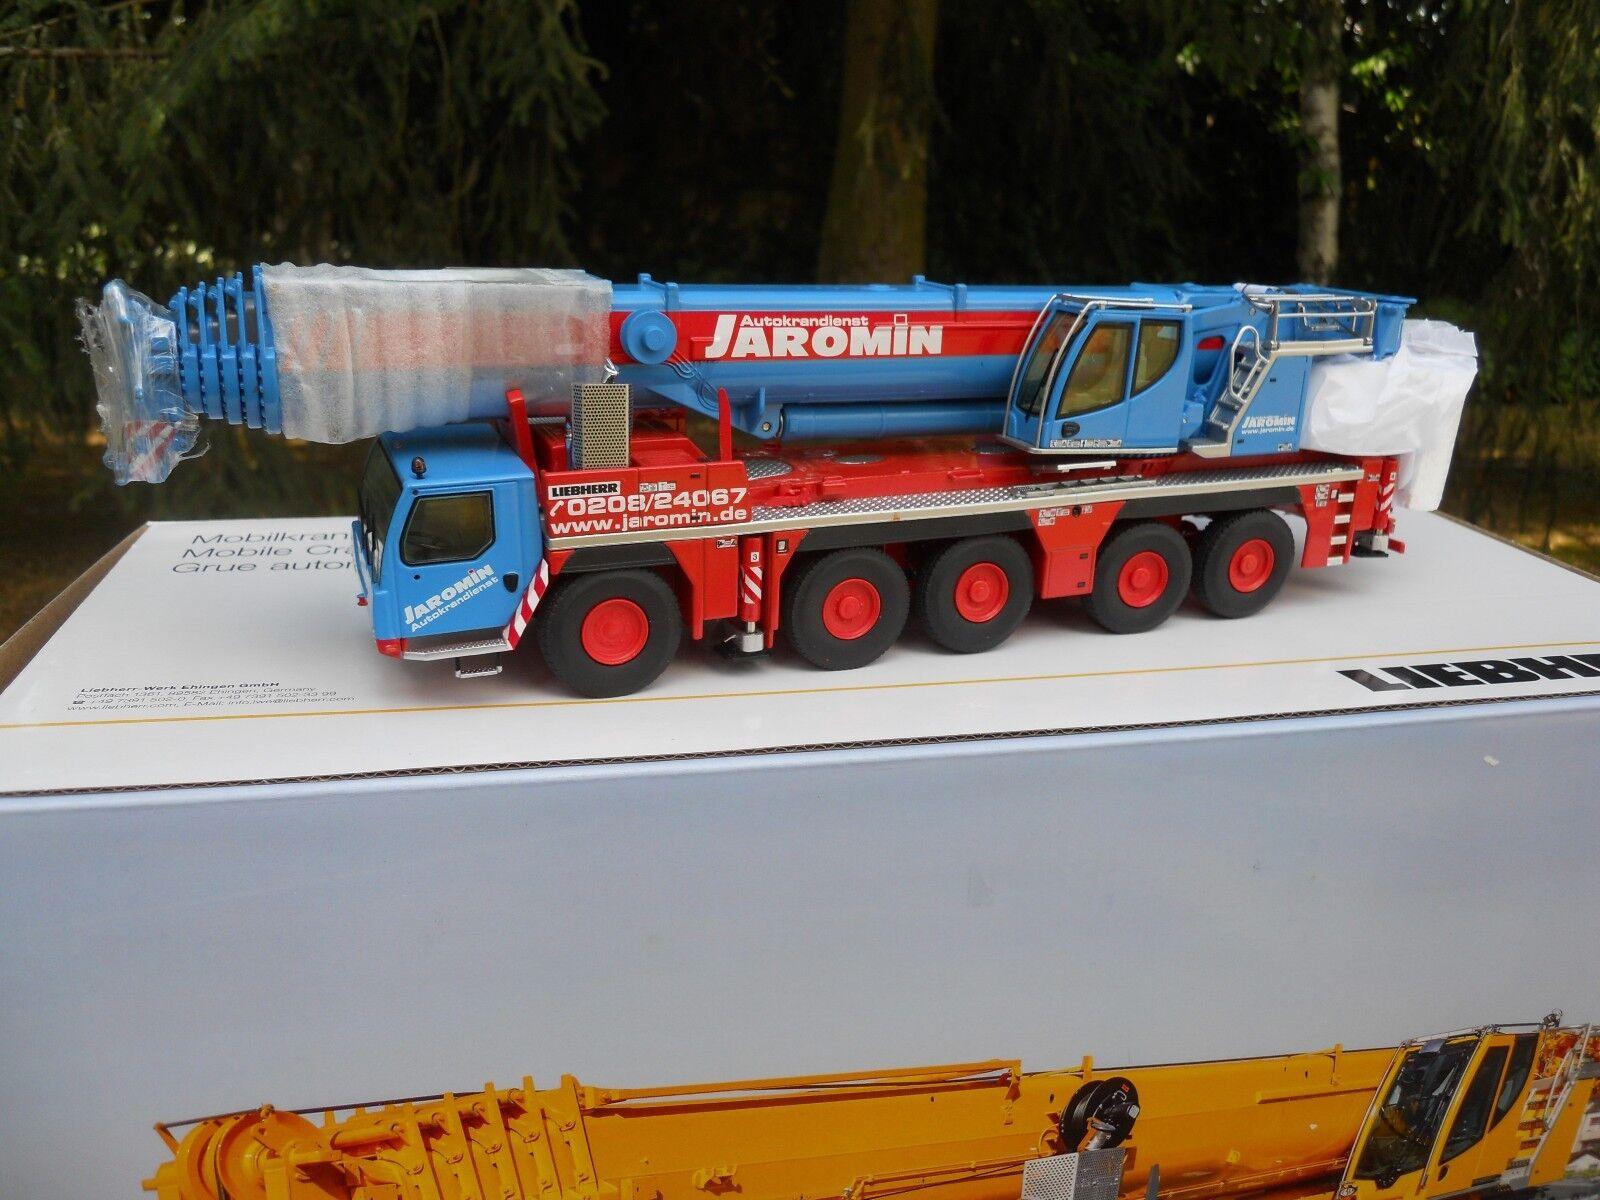 NZG 959 05 LIEBHERR LTM 1250-5.1   JAROMIN   MINIATURA NUEVA EN CAJA